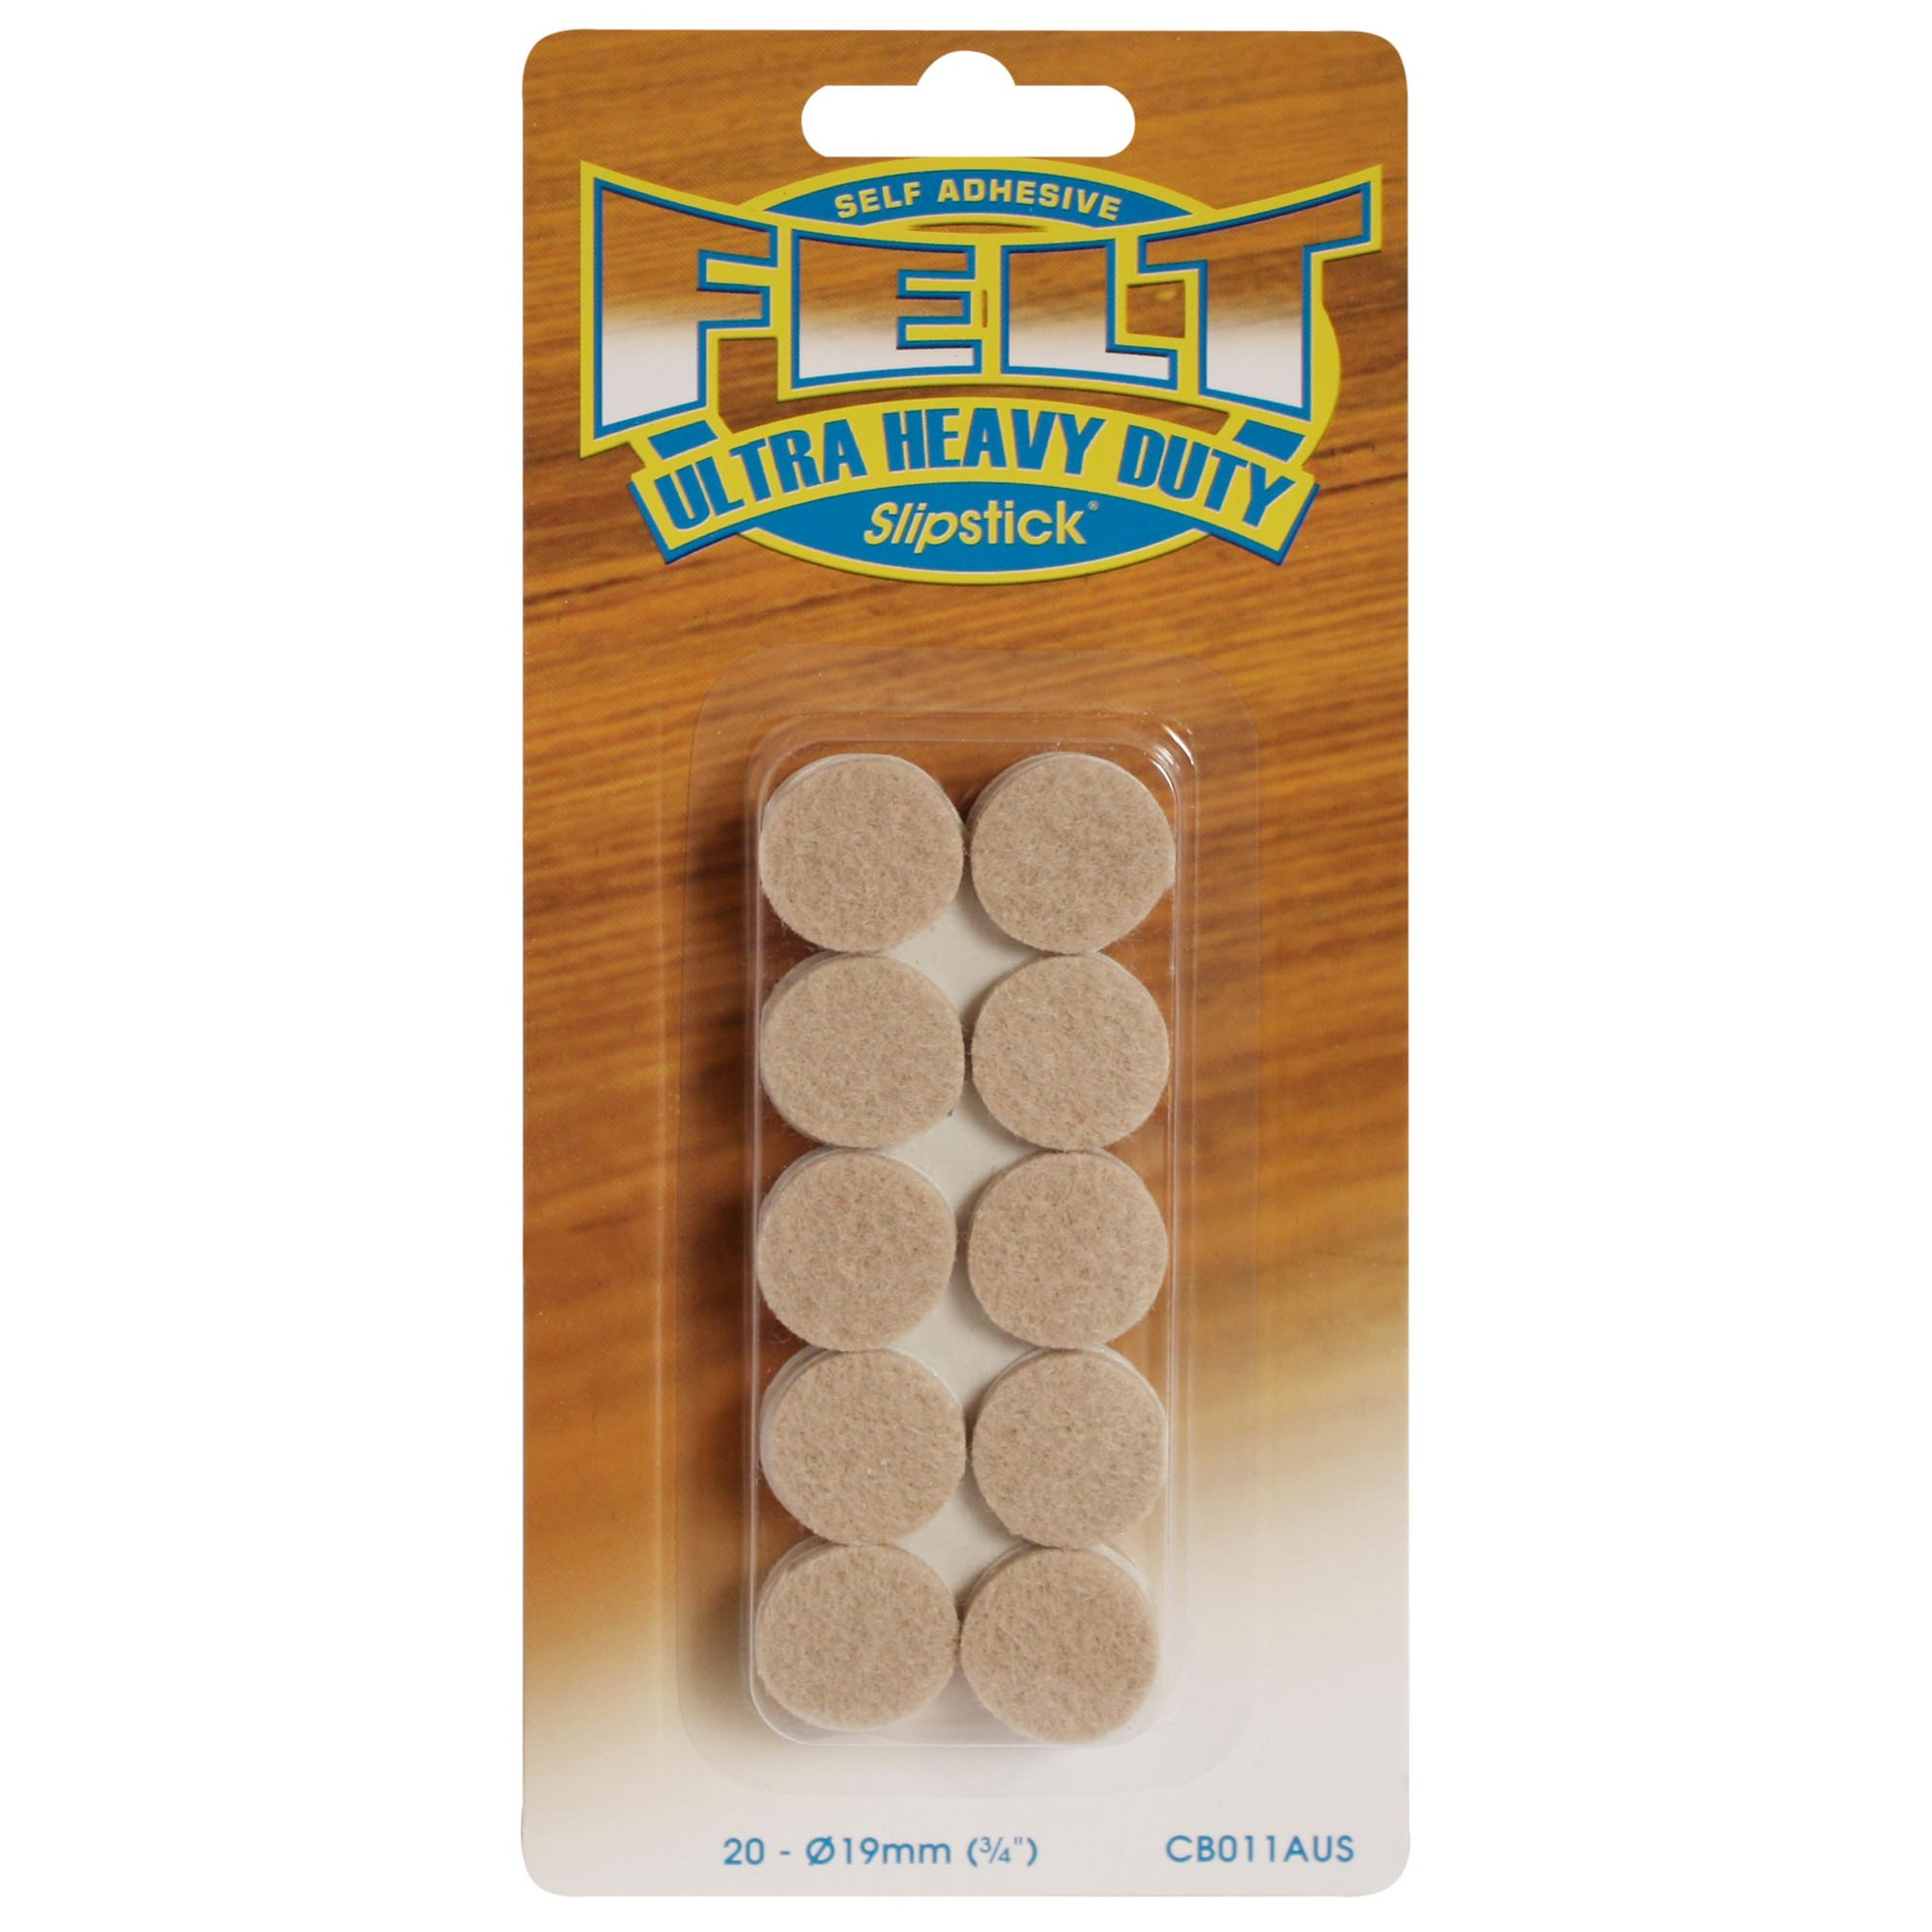 Slipstick Heavy Duty Felt Pads, 1.9cm, Round, 20 Pack